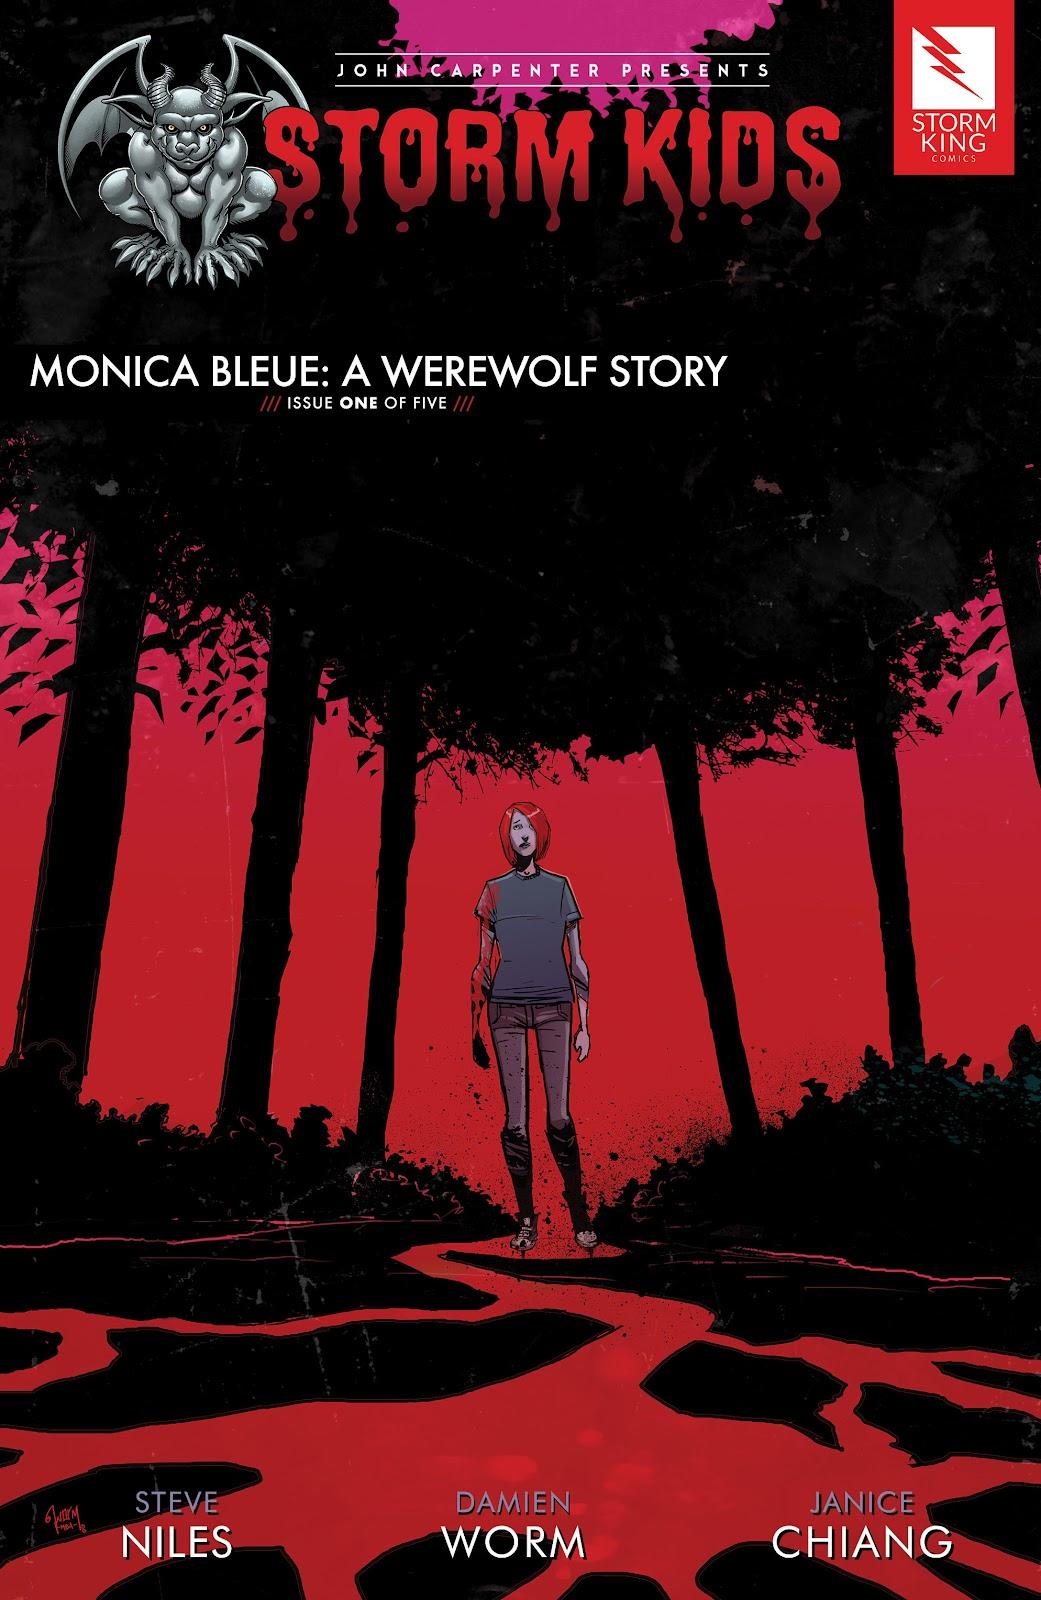 Read online John Carpenter Presents Storm Kids: Monica Bleue: A Werewolf Story comic -  Issue #1 - 1